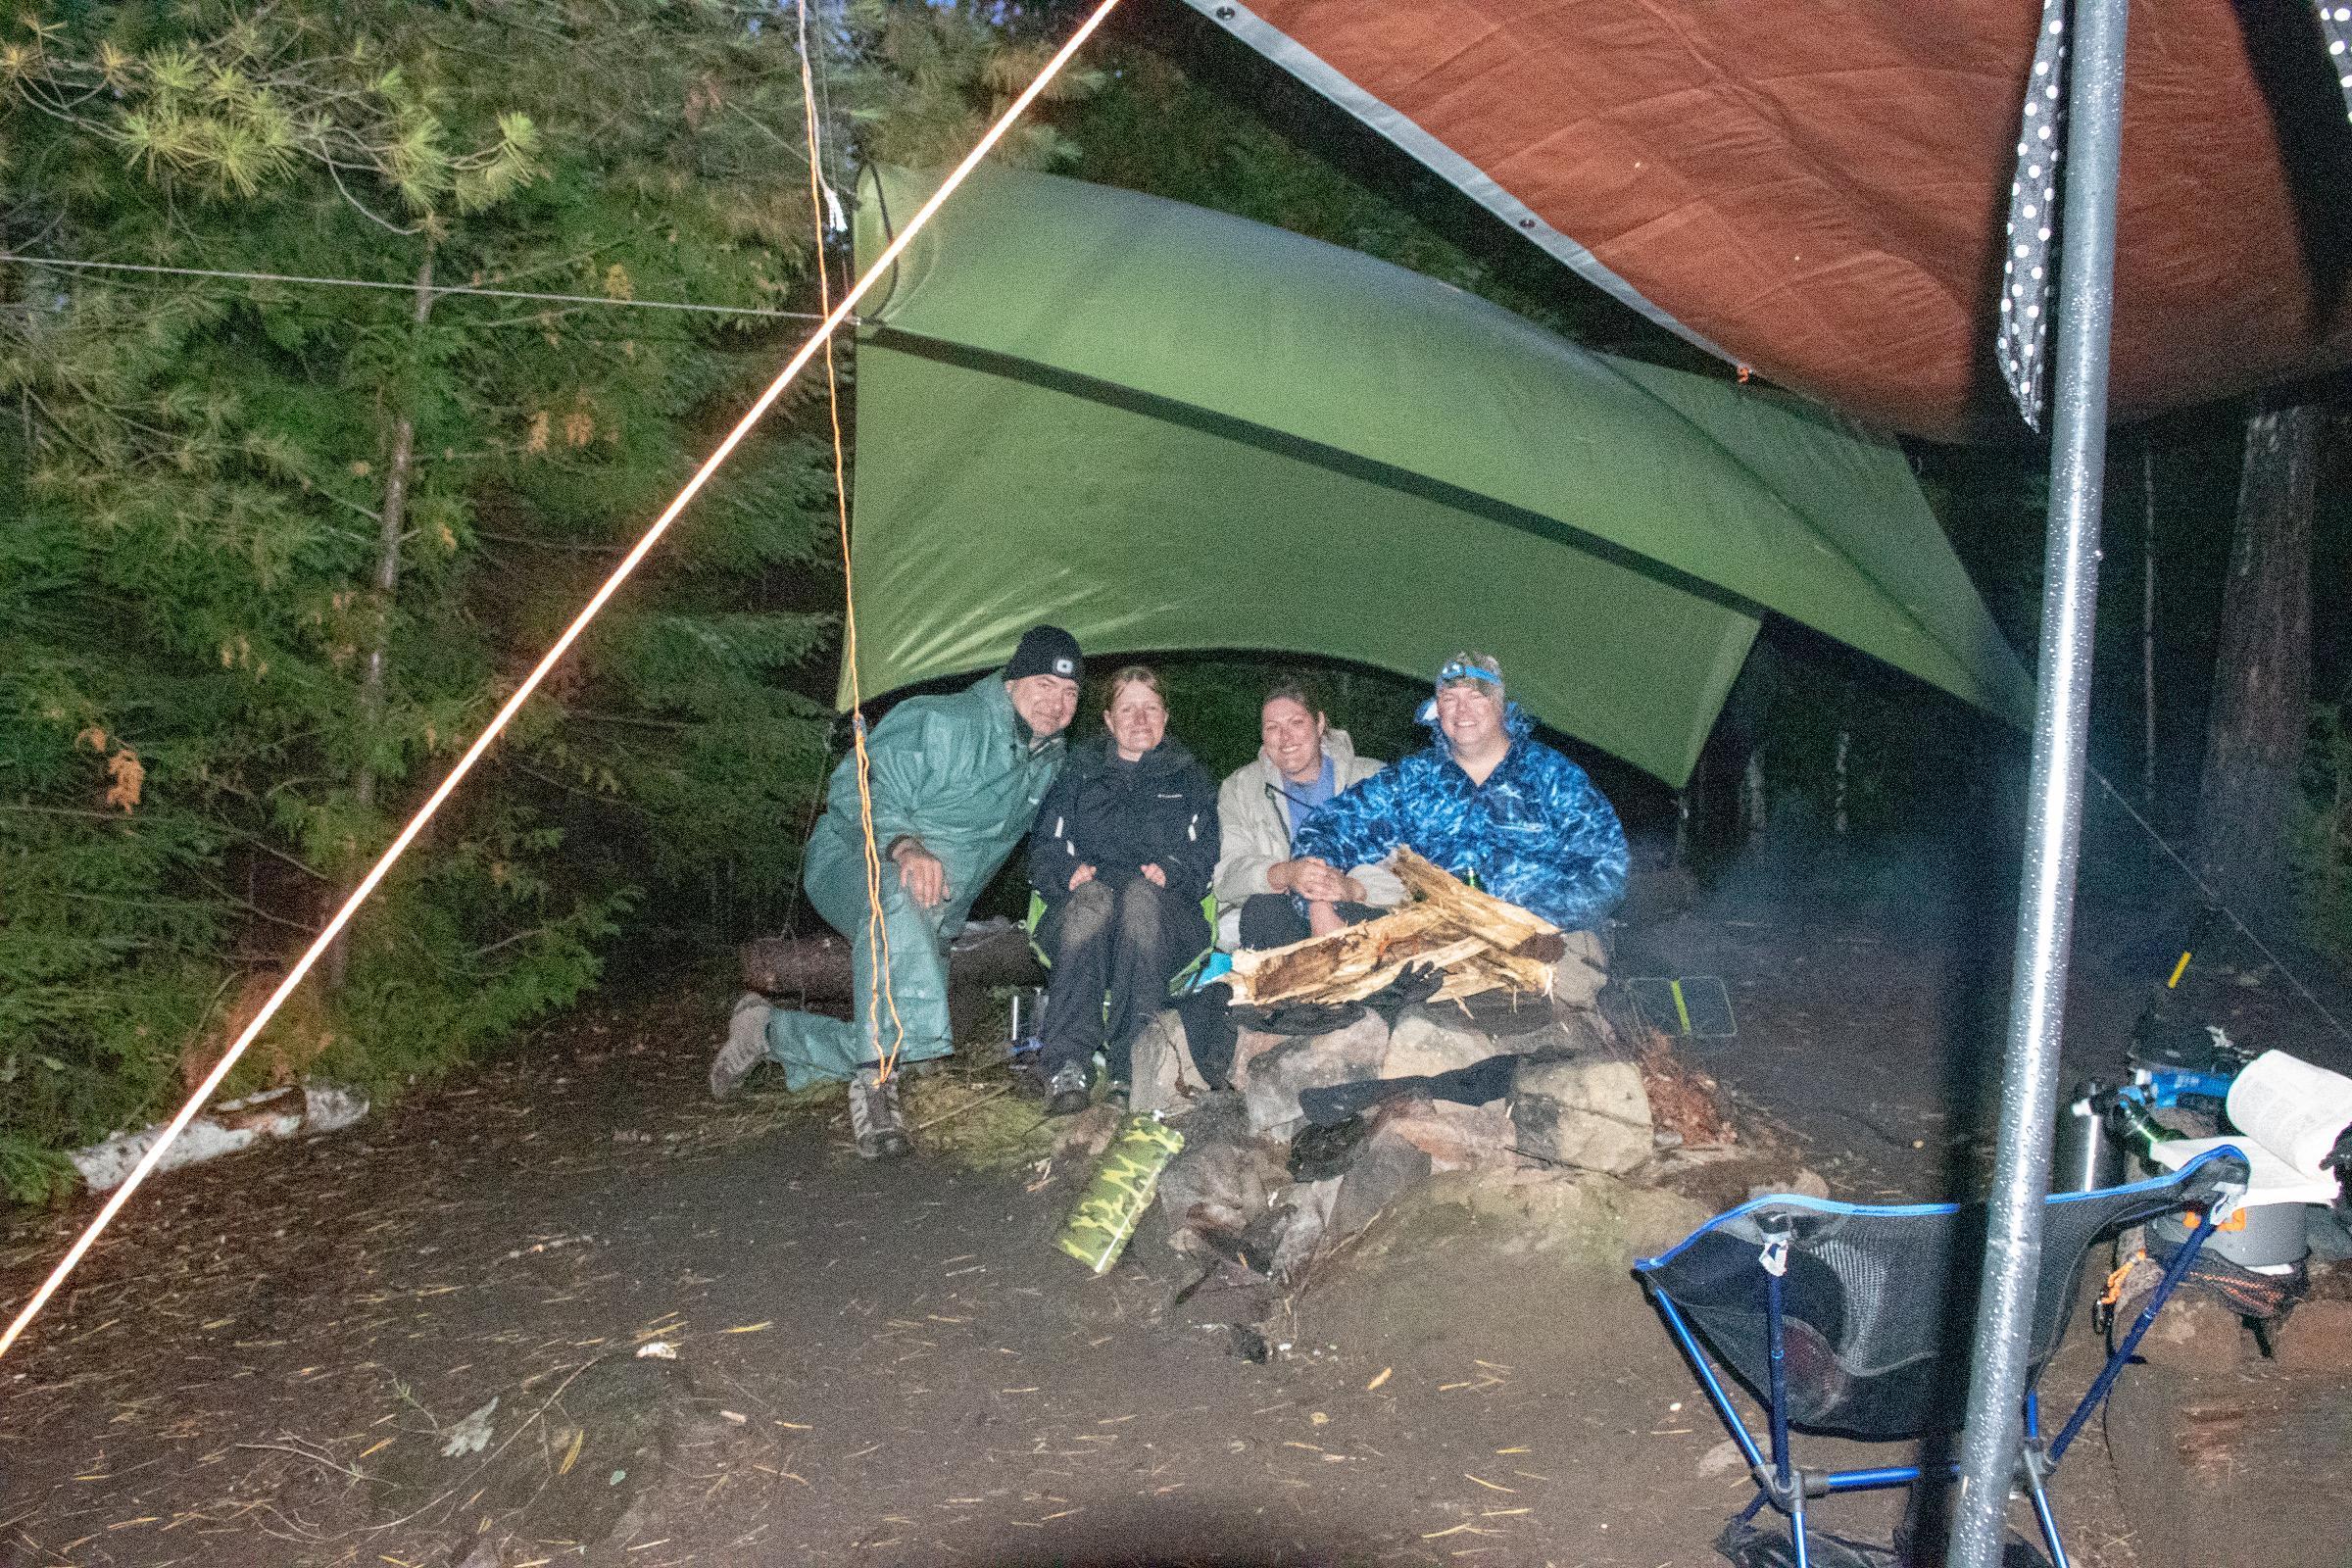 Campfire Gaskin